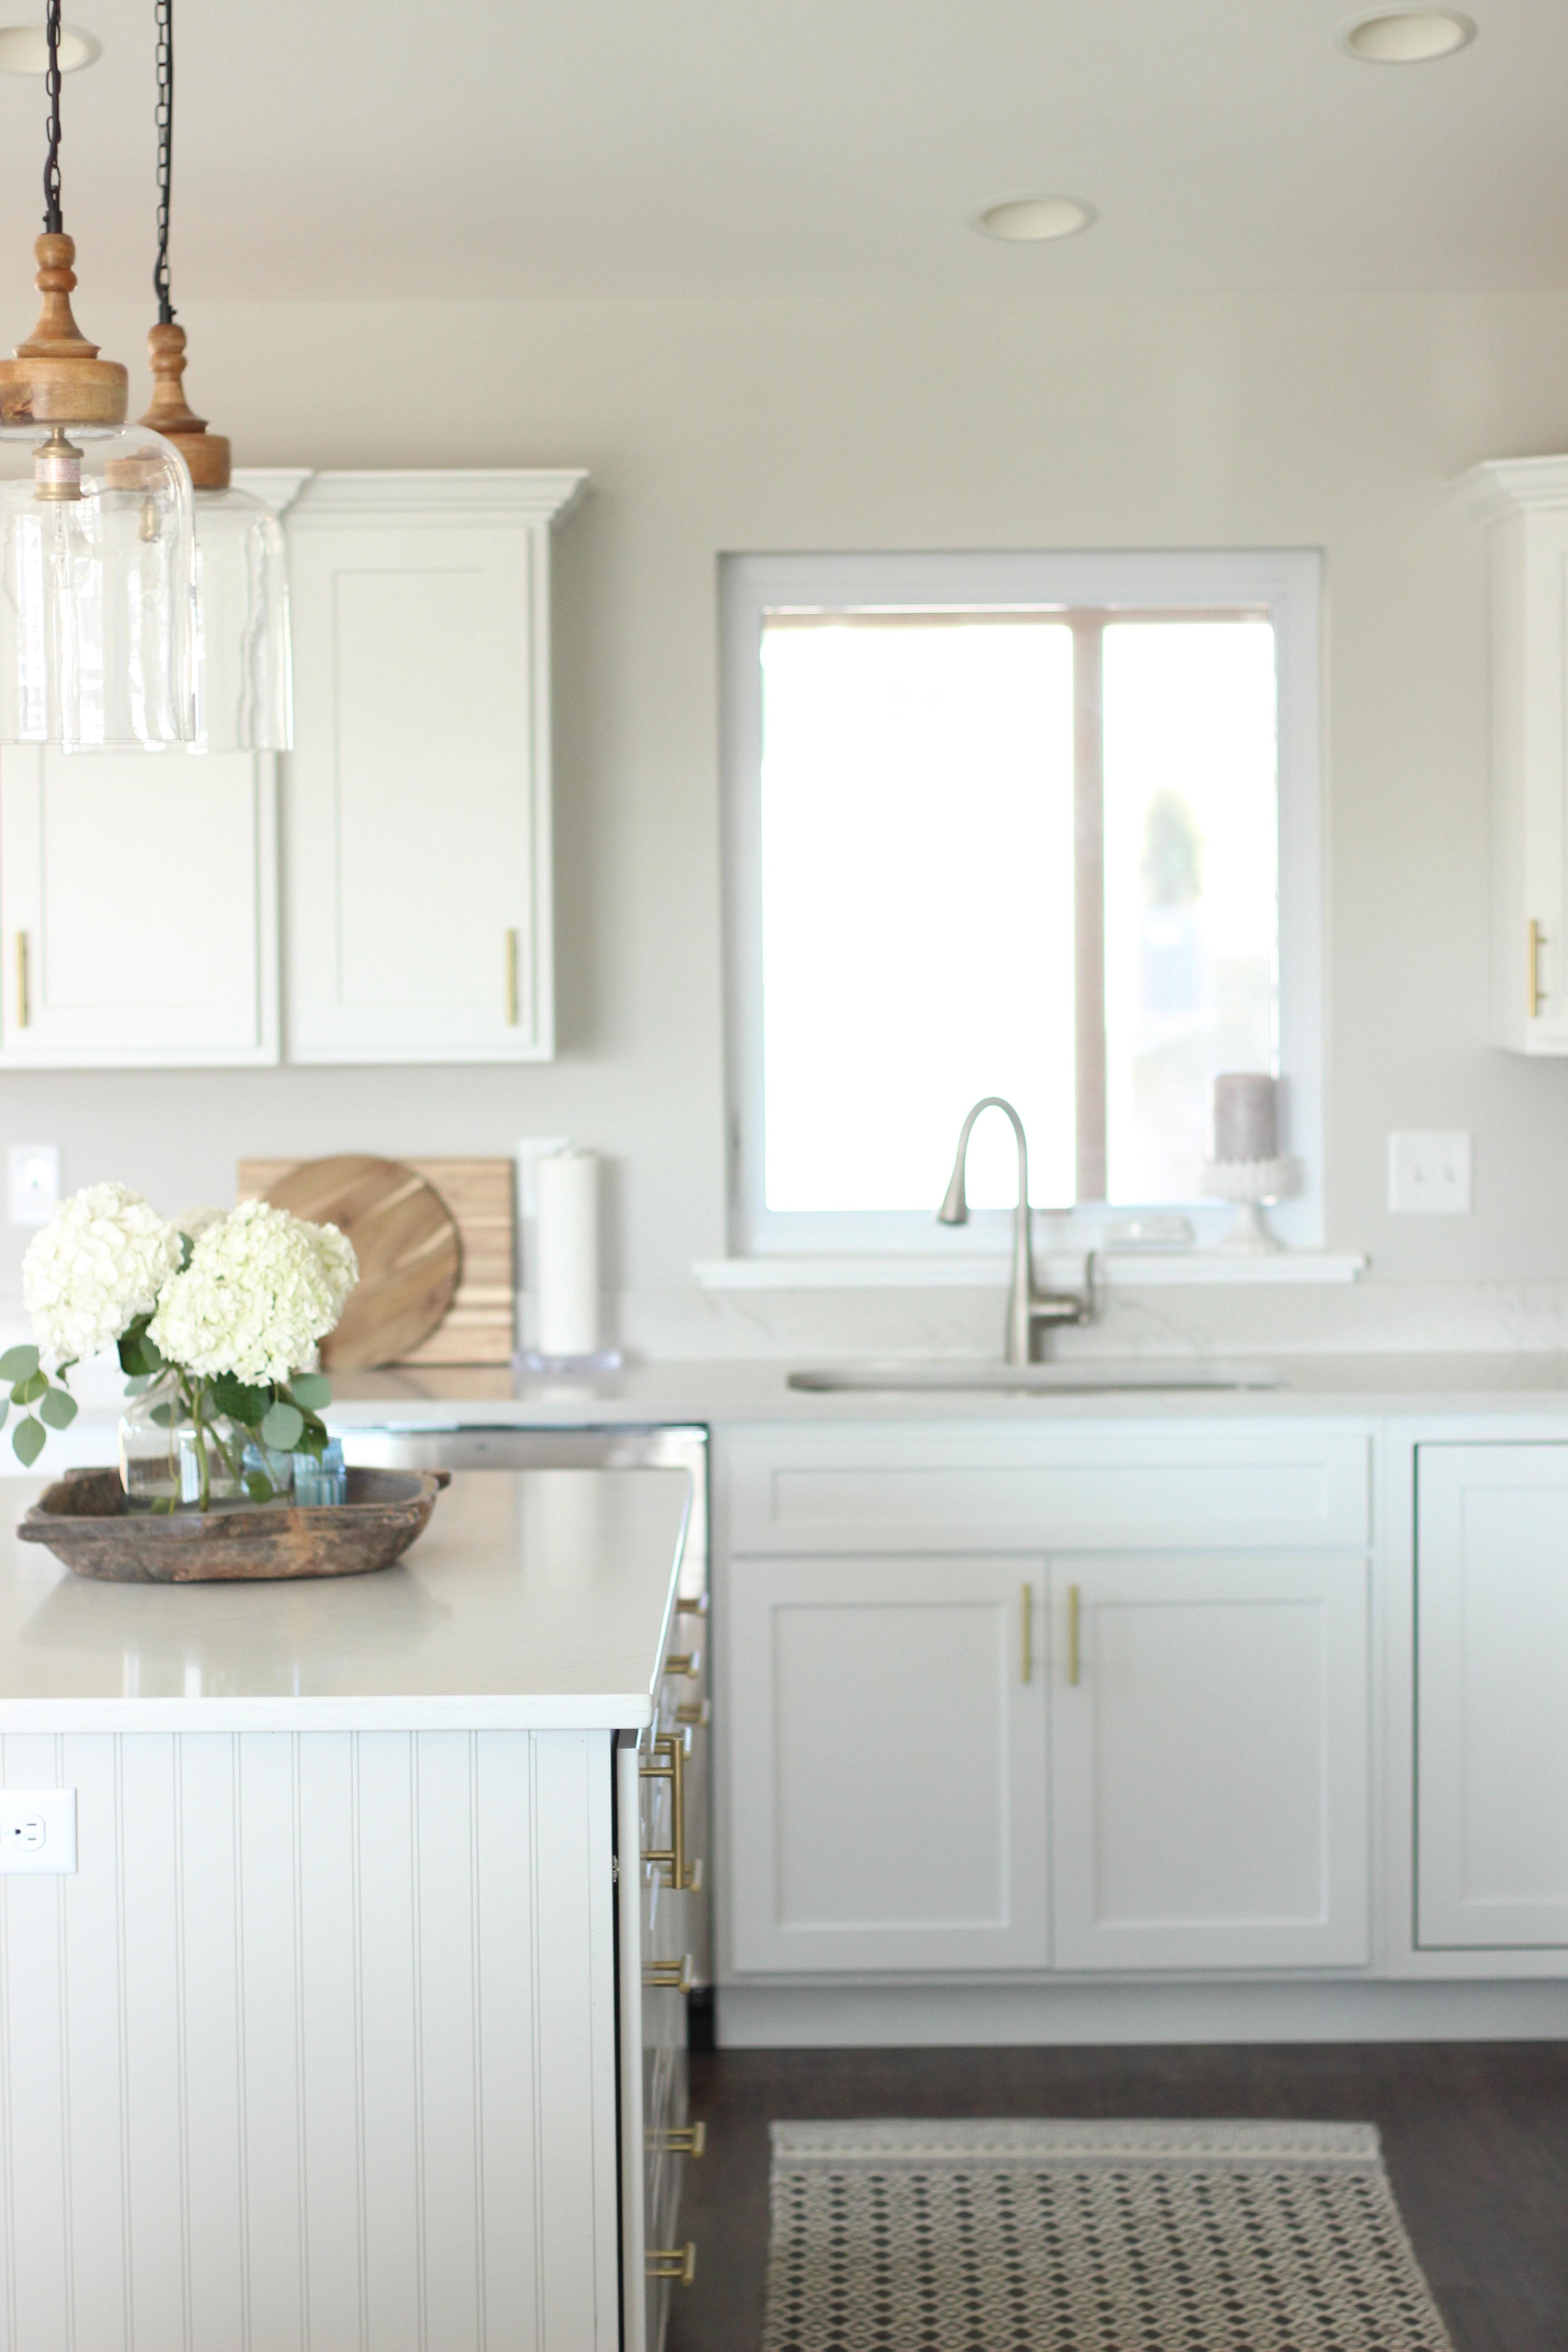 Bright White Modern Farmhouse Kitchen Reveal - A Dash of Bruck